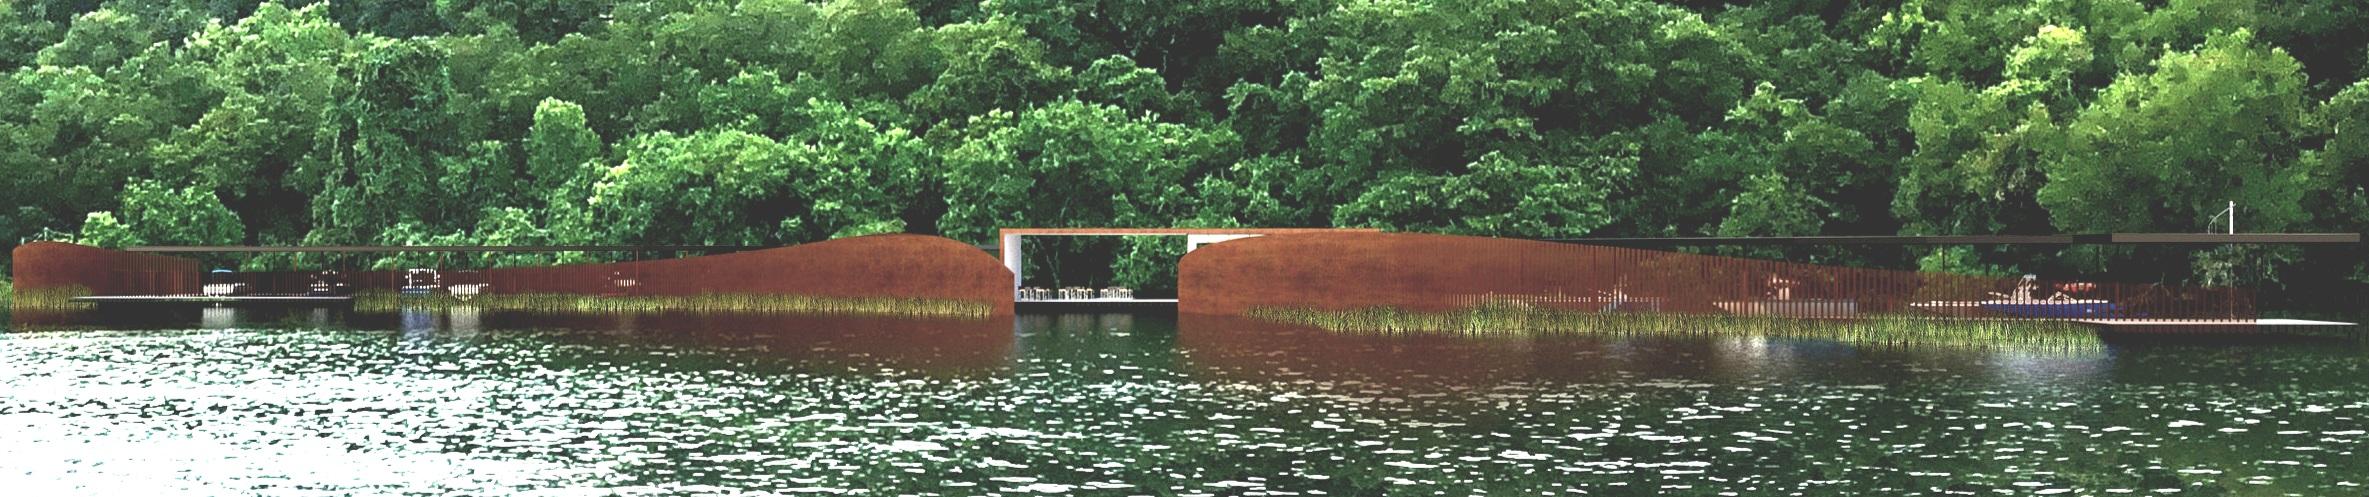 Dock%2BRender%2B2.jpg